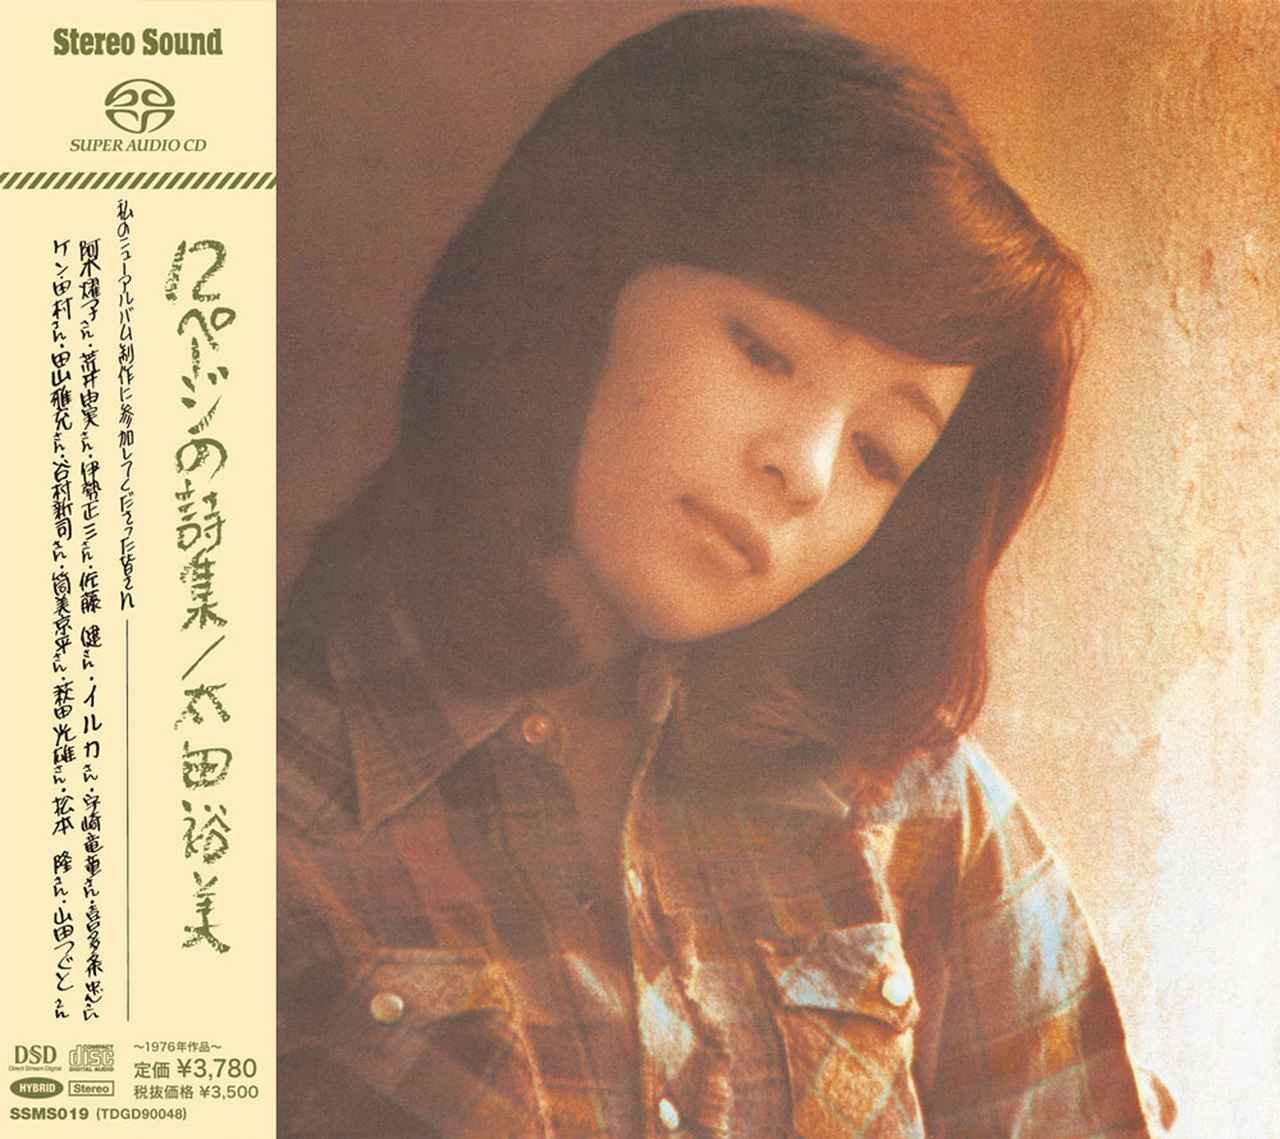 Images : 太田裕美「12ページの詩集」(SACD) SSMS-019